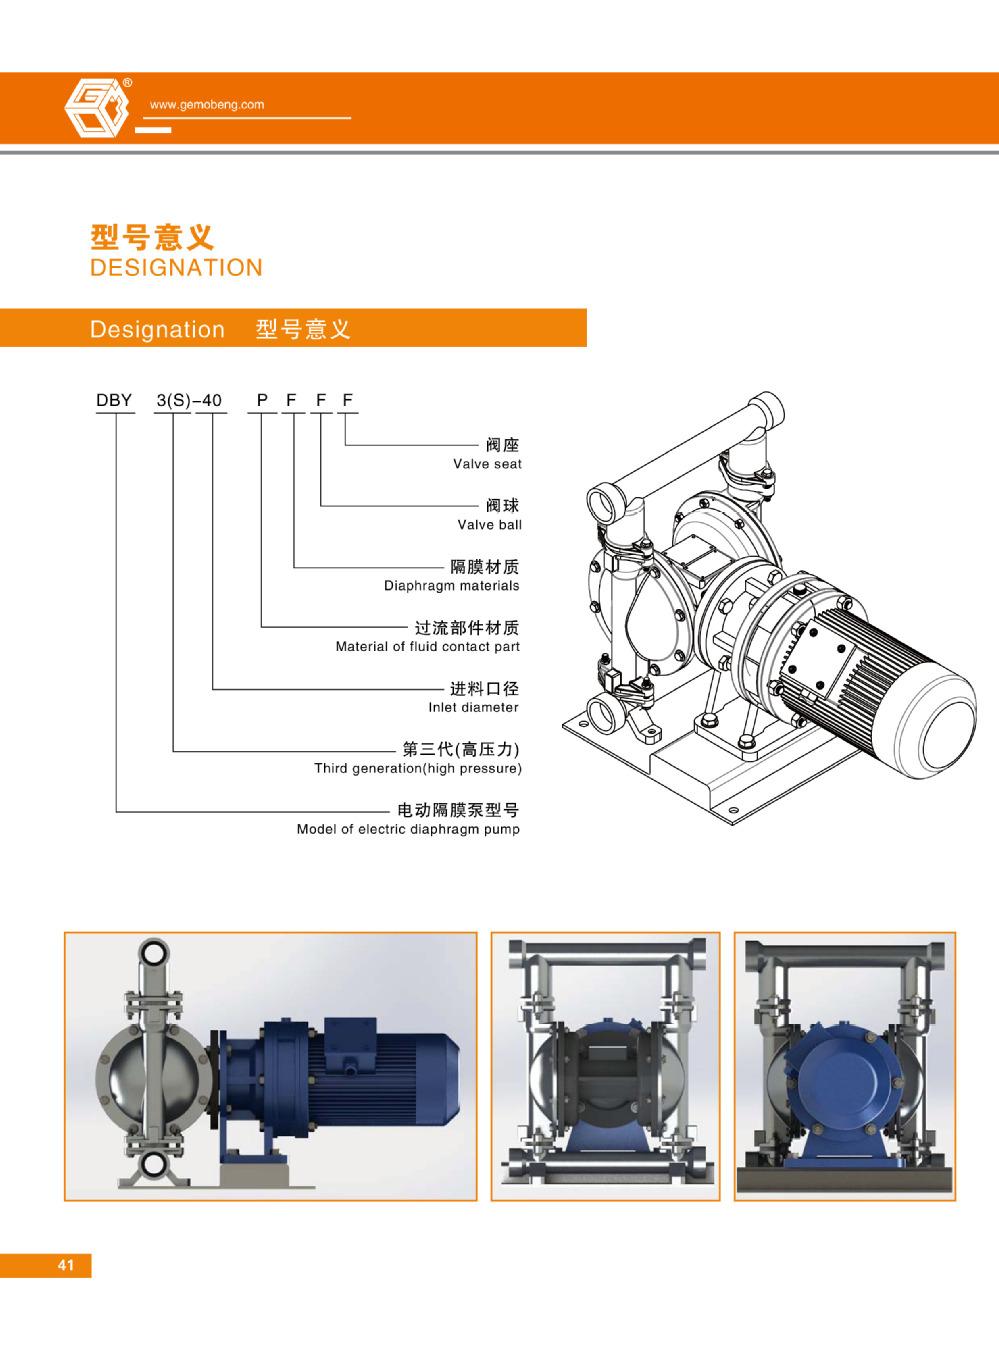 Fuel Pump Diaphragm Material : Electric diaphragm pump anti corrosion buy